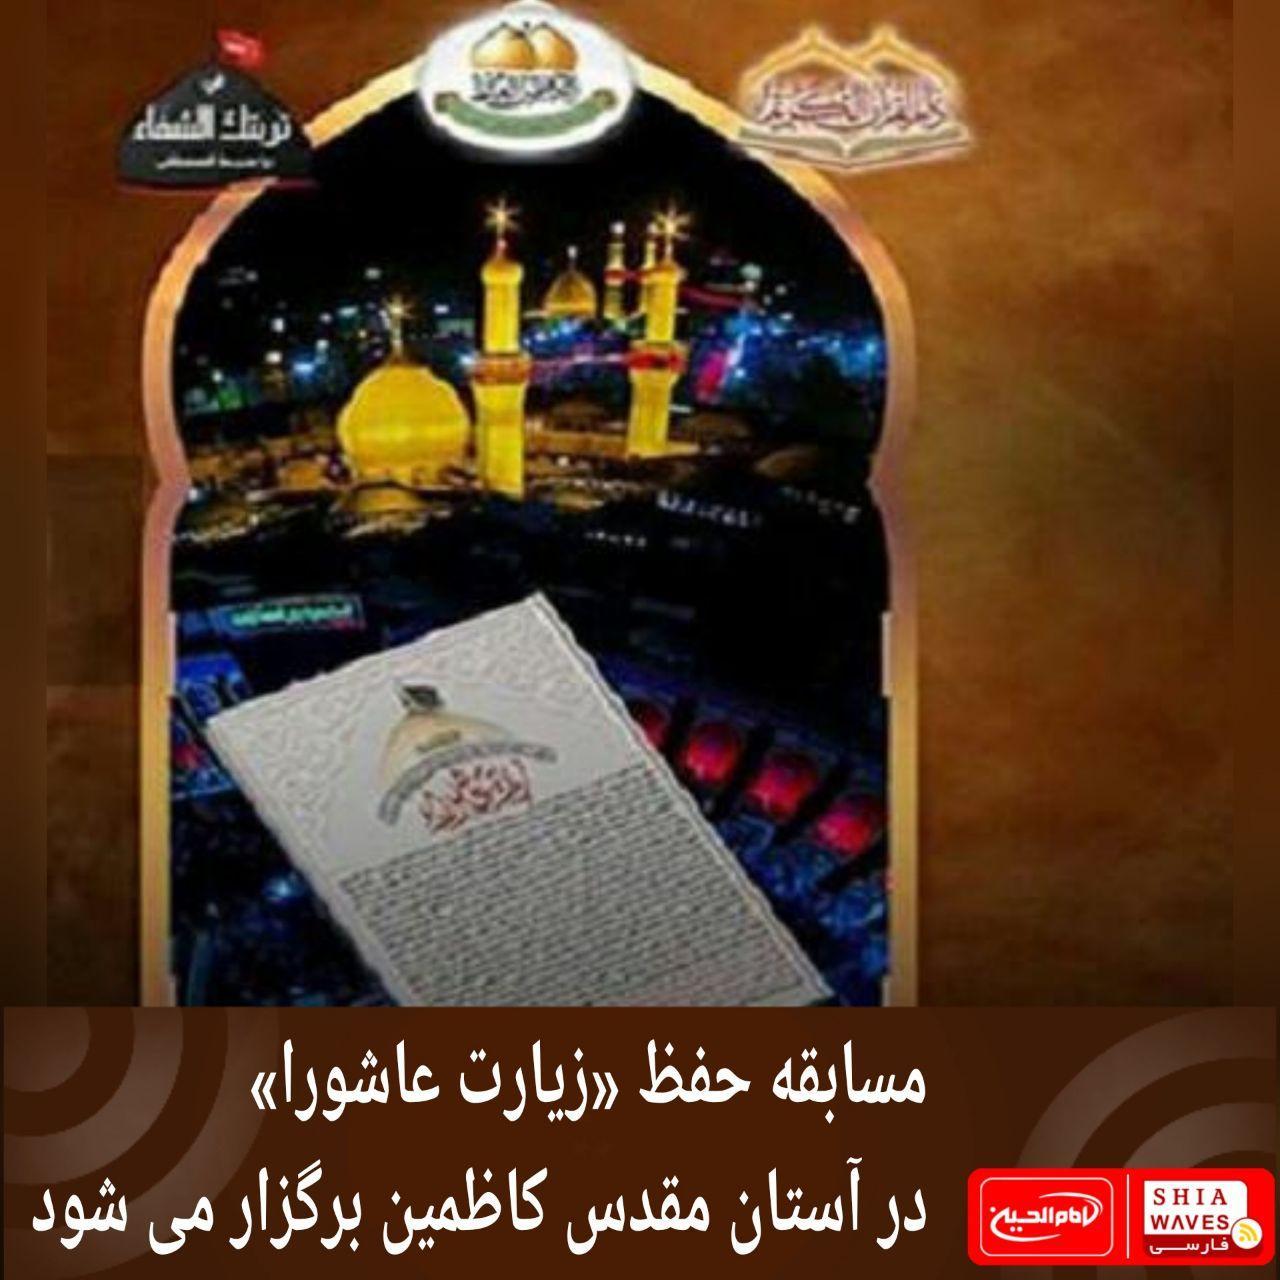 Photo of مسابقه حفظ «زیارت عاشورا» در آستان مقدس کاظمین برگزار می شود